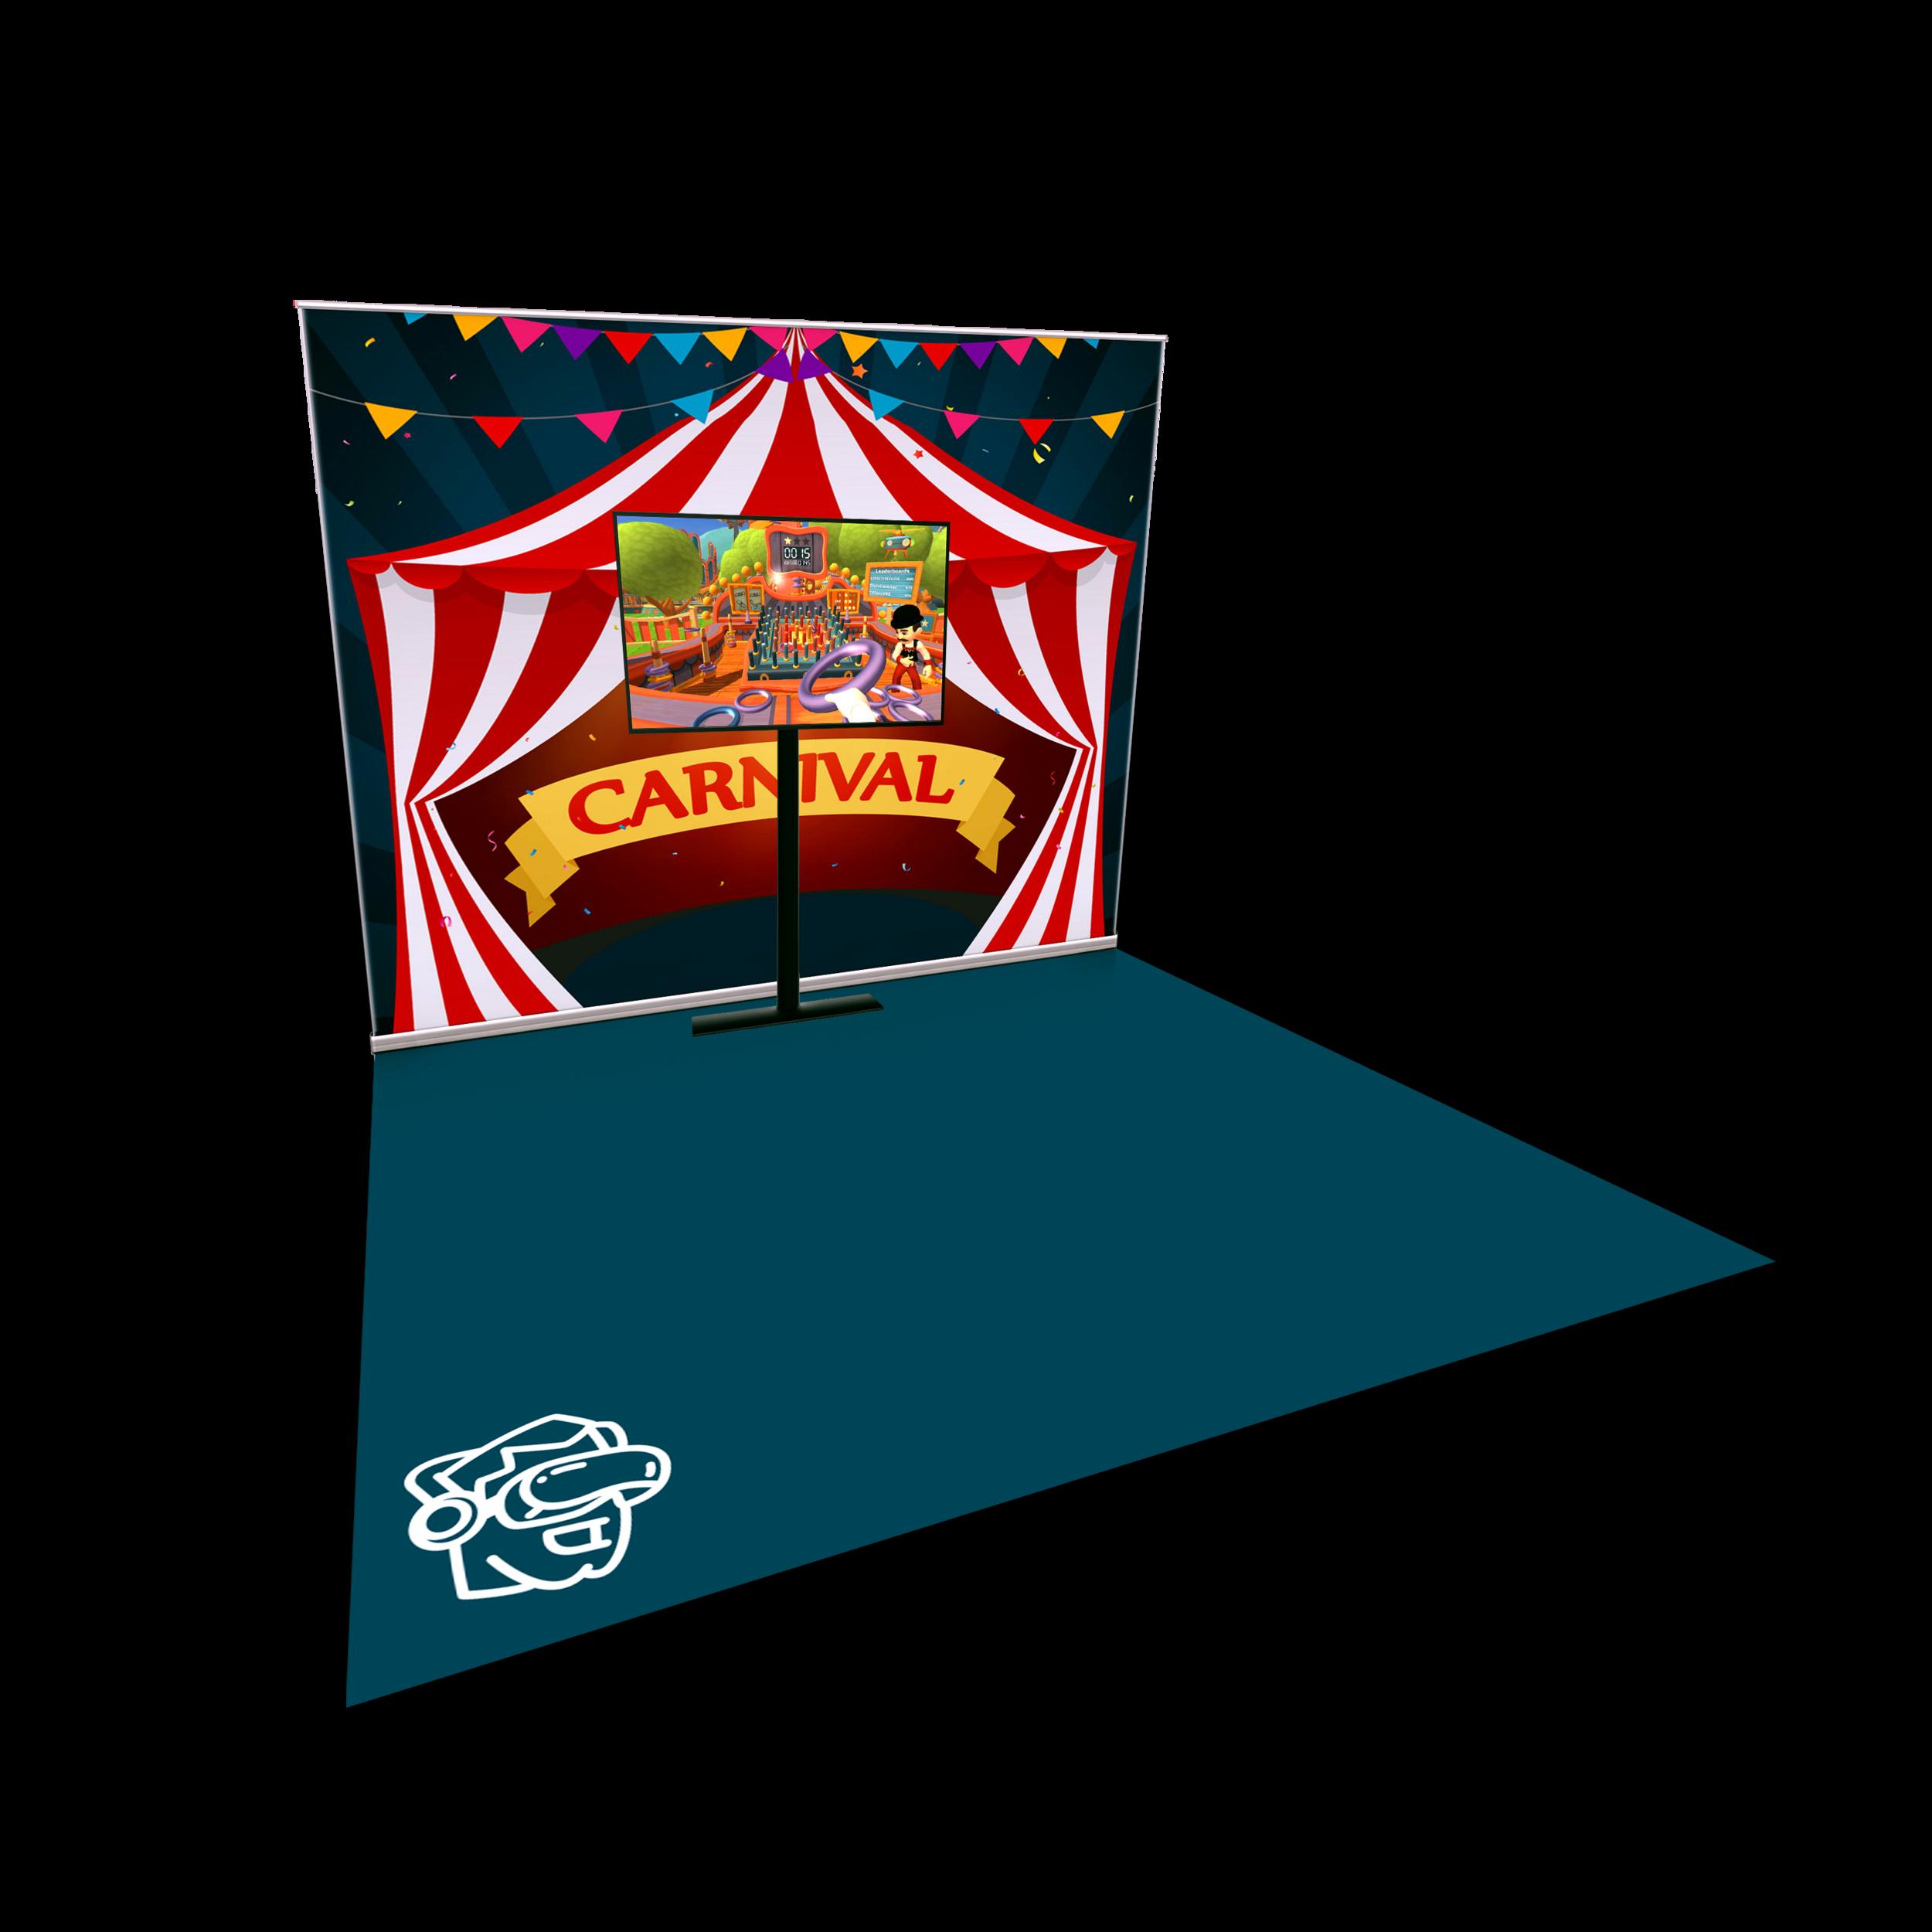 Setup_Mockup_-_Carnival.png